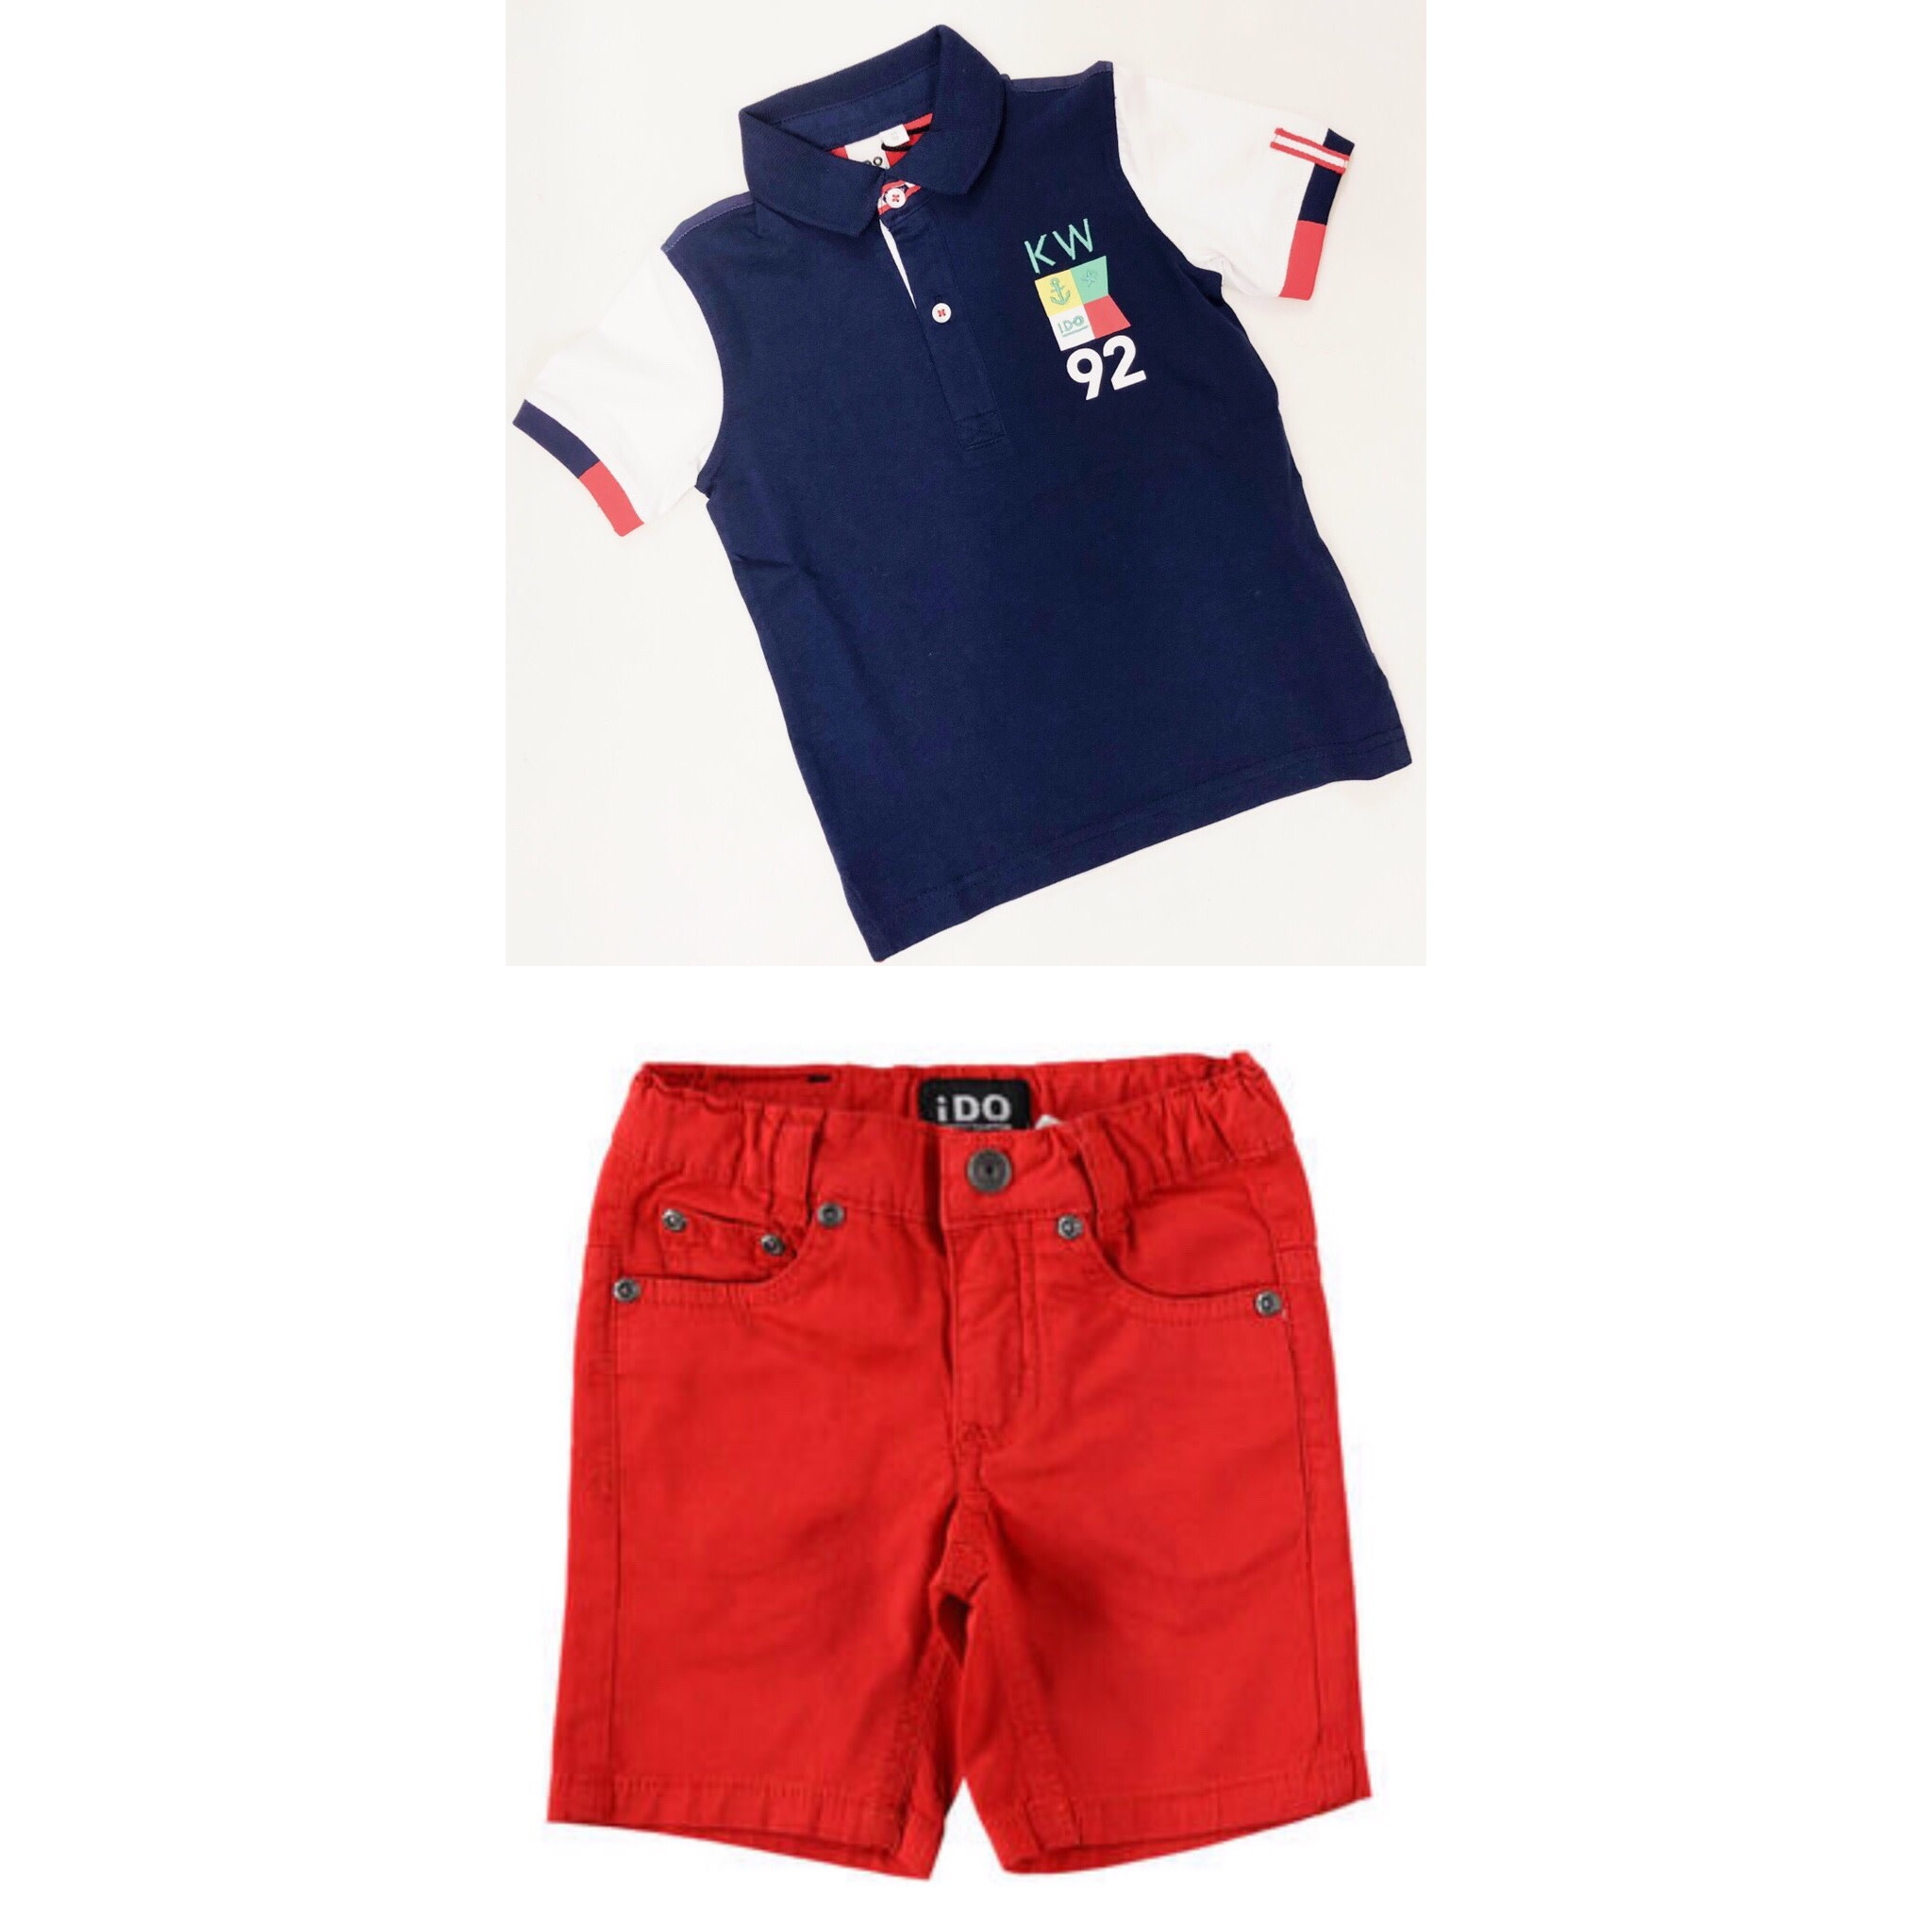 Ido IDo Navy Polo Shirt and Red Short Set